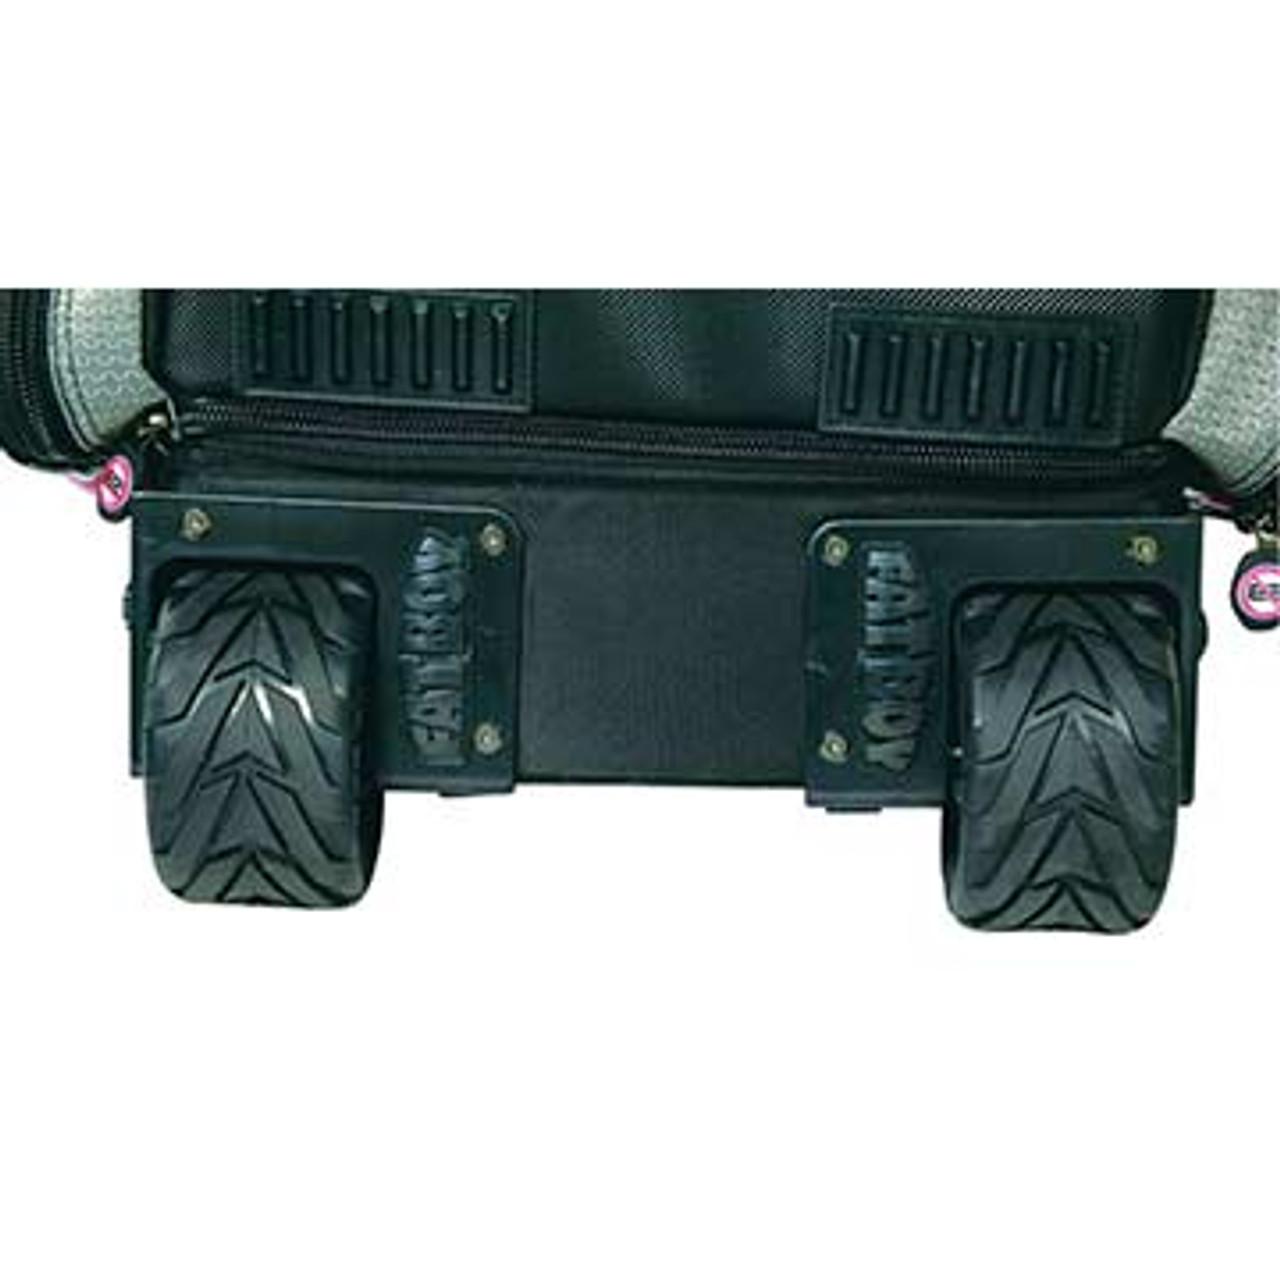 Gearguard No Errors Intermediate Catchers Bag Wfatboy Wheels Black